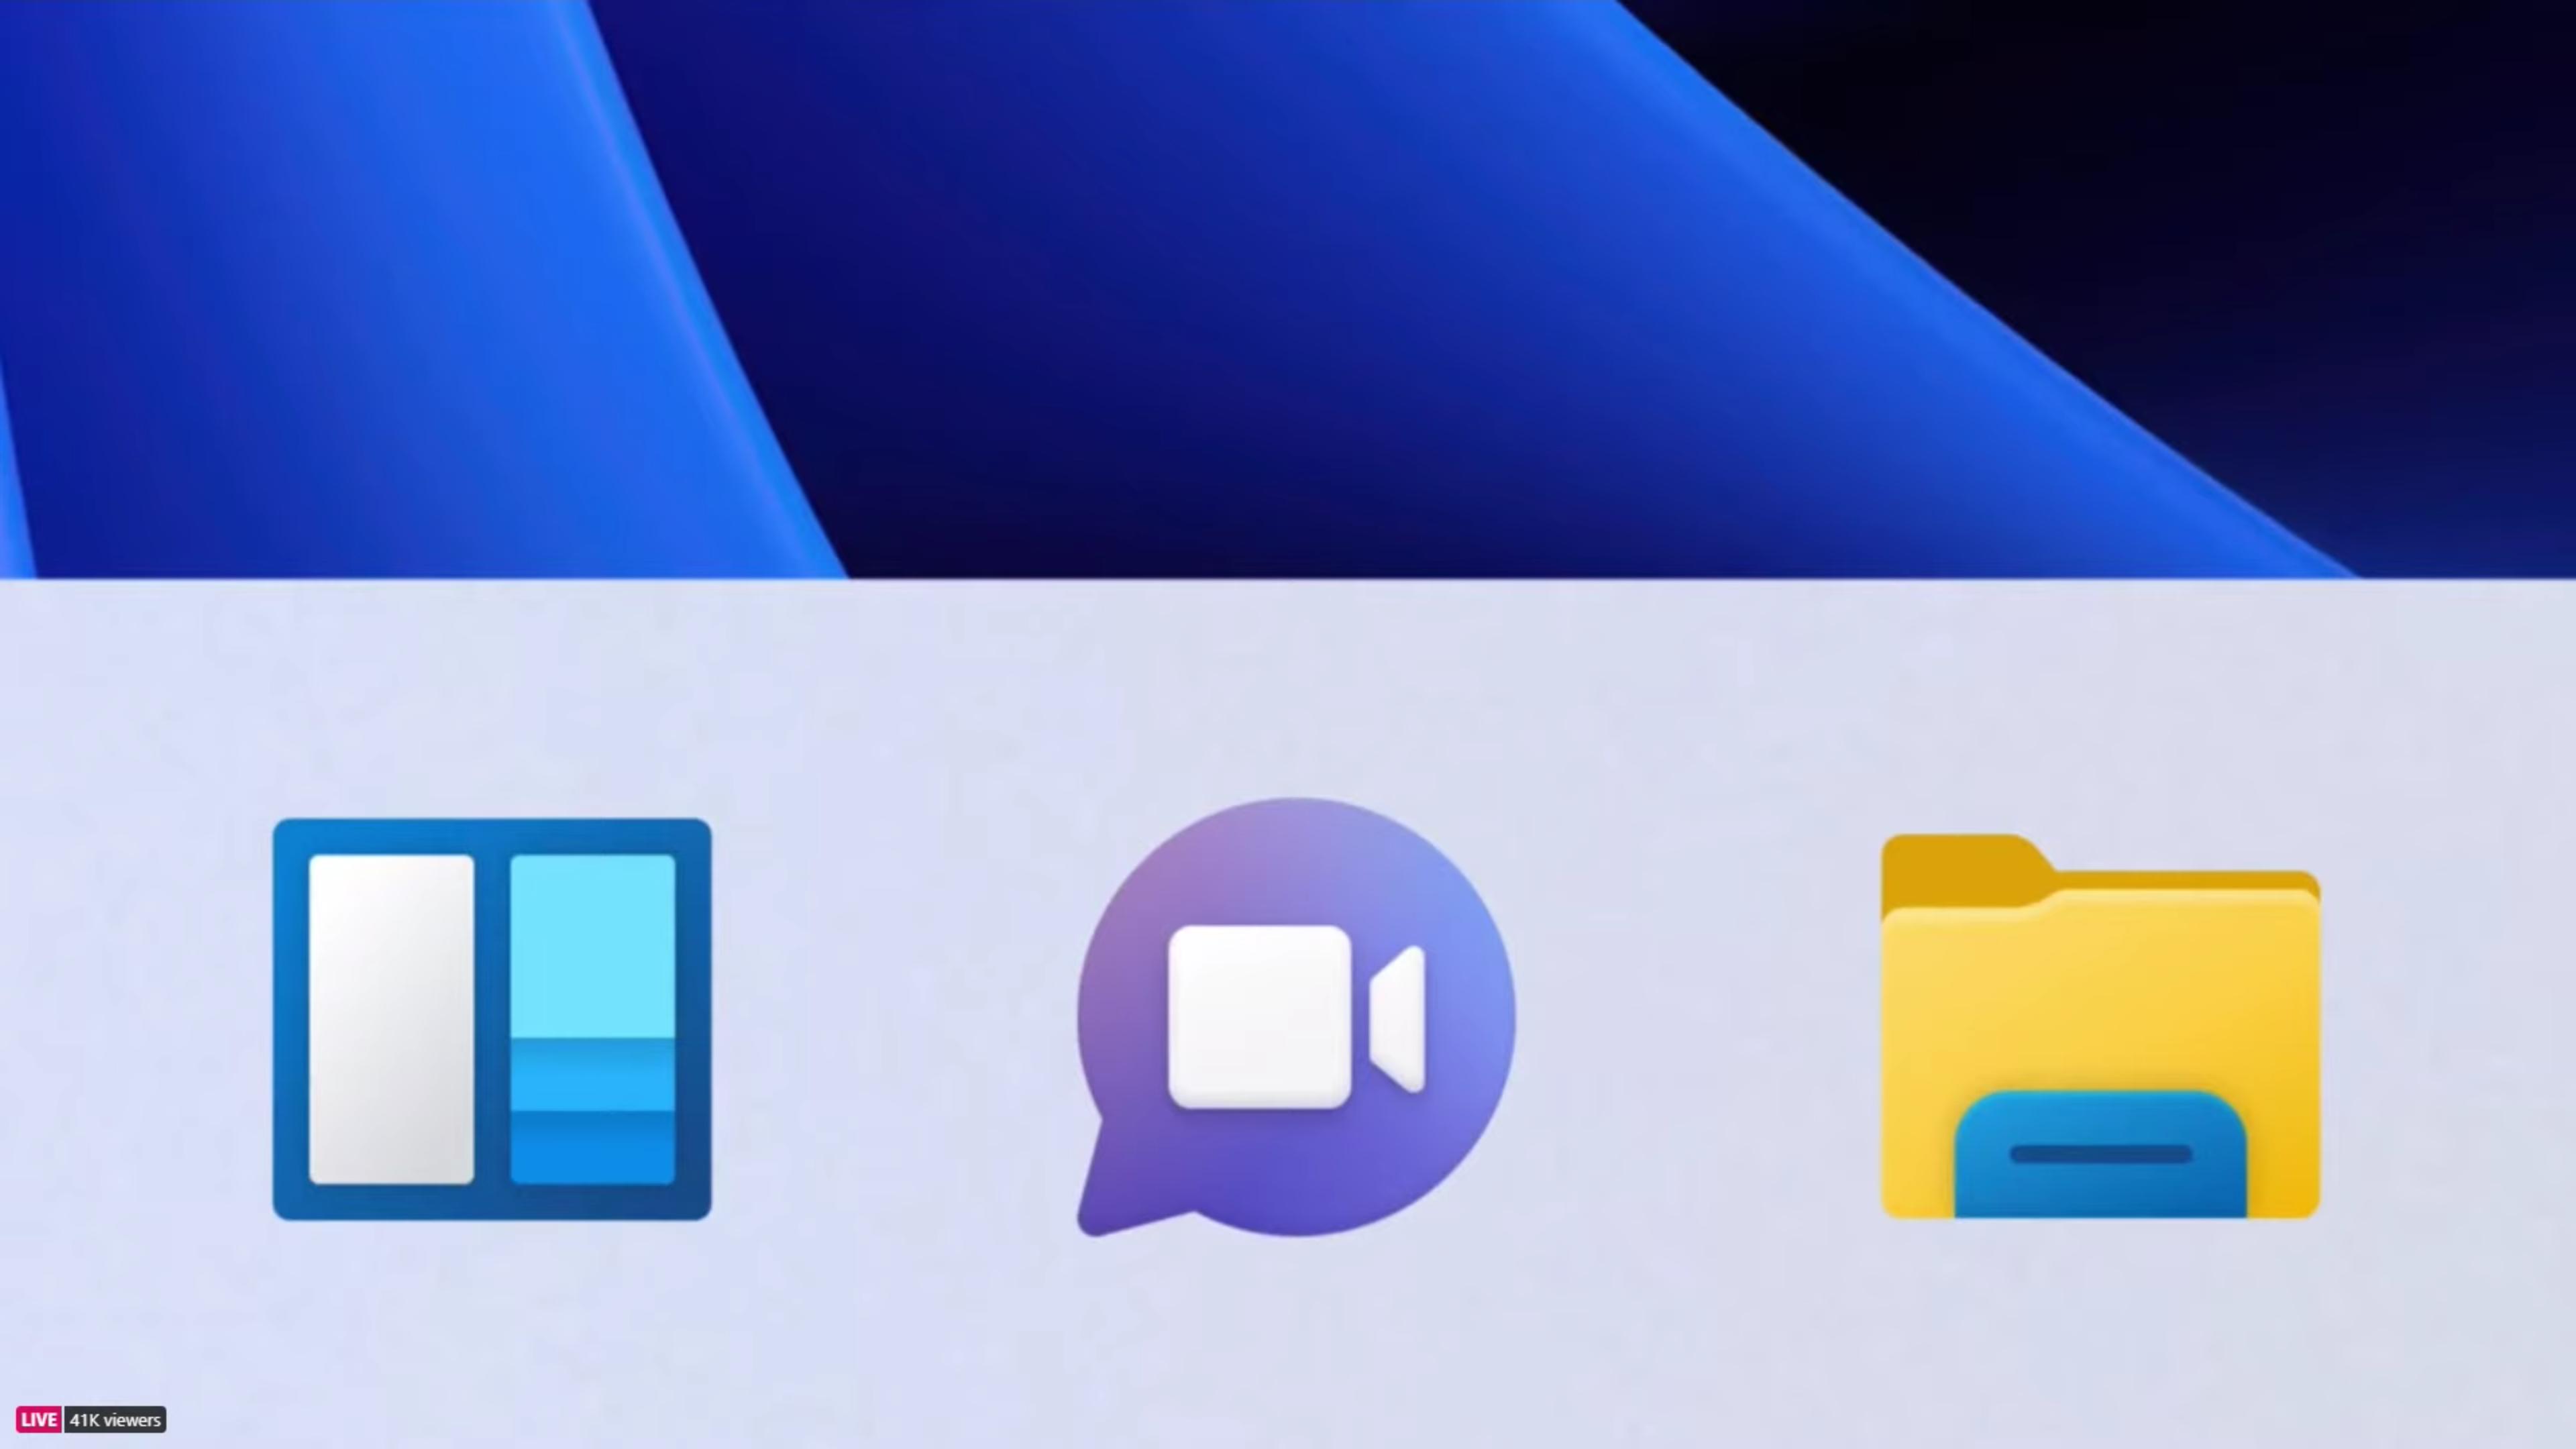 Microsoft-windows-11-ads-24-2021-cnet-017.png